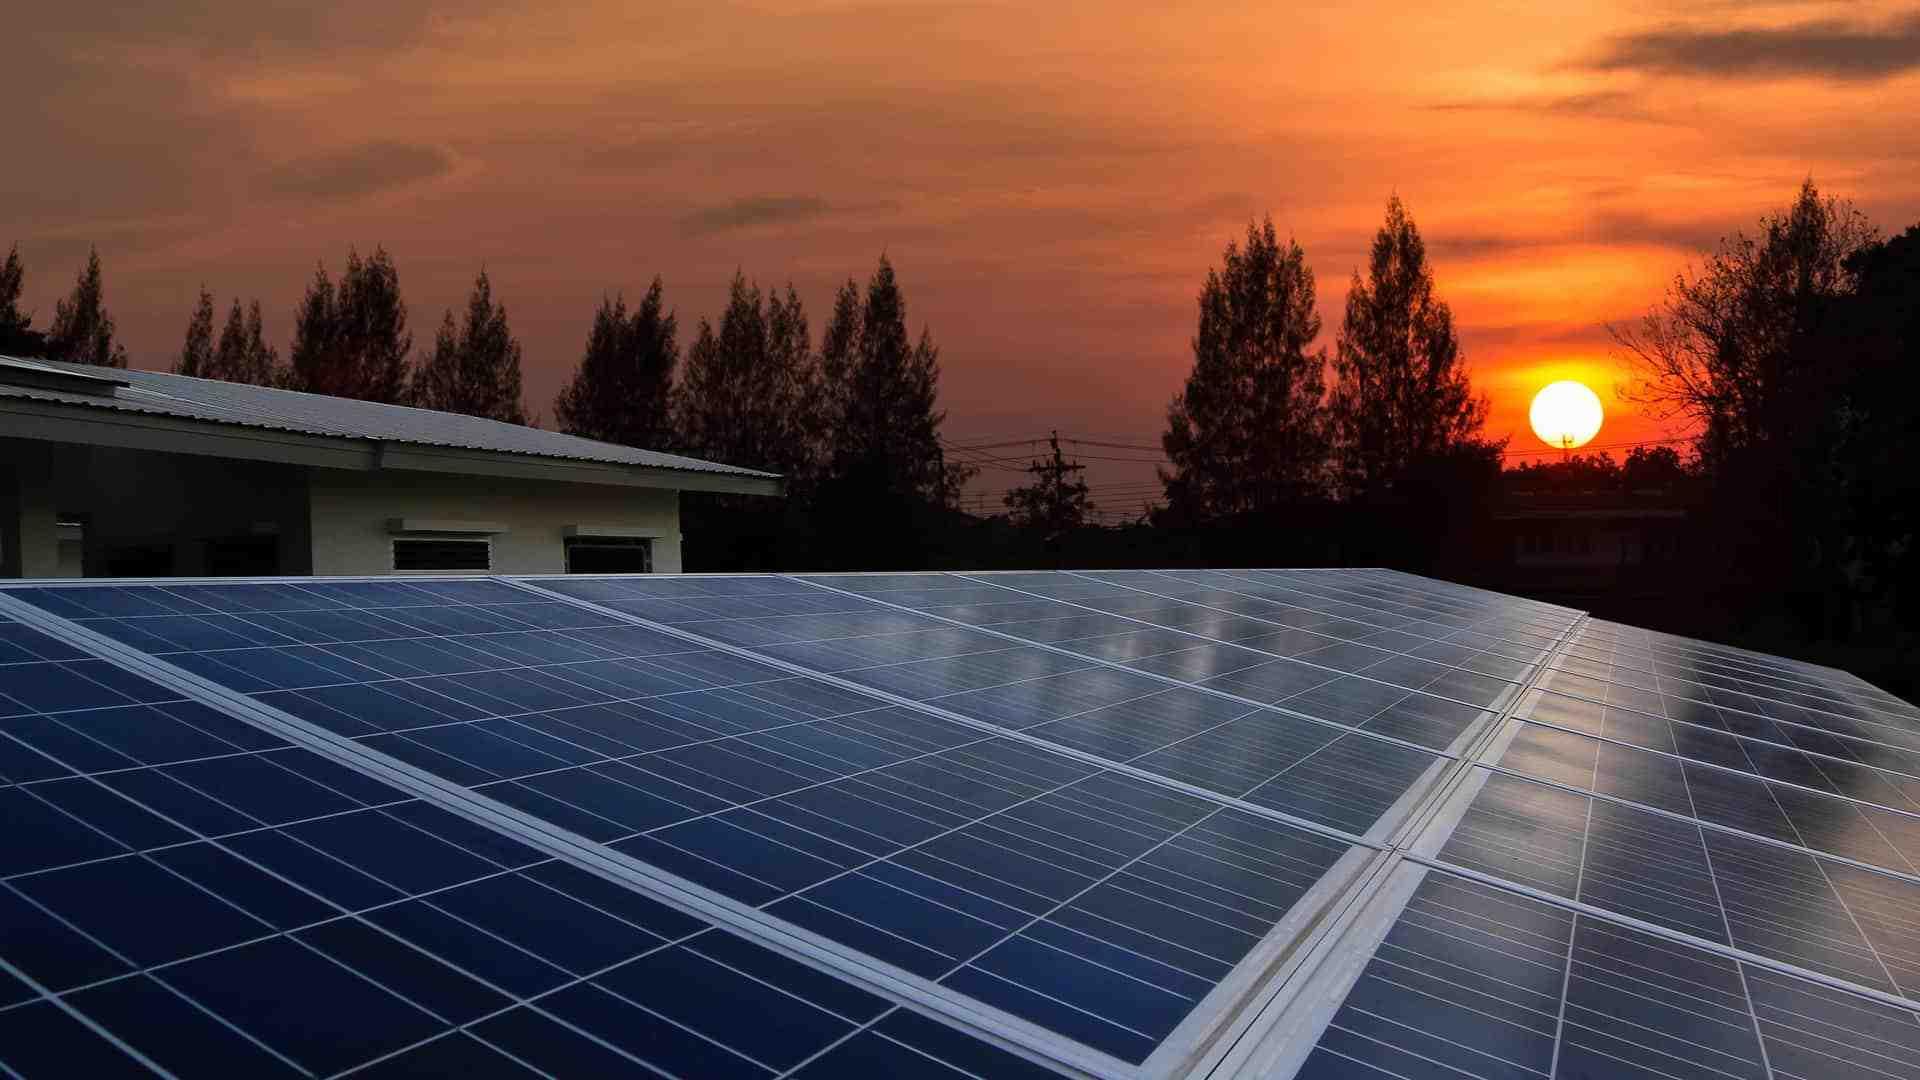 How do I choose a solar panel provider?